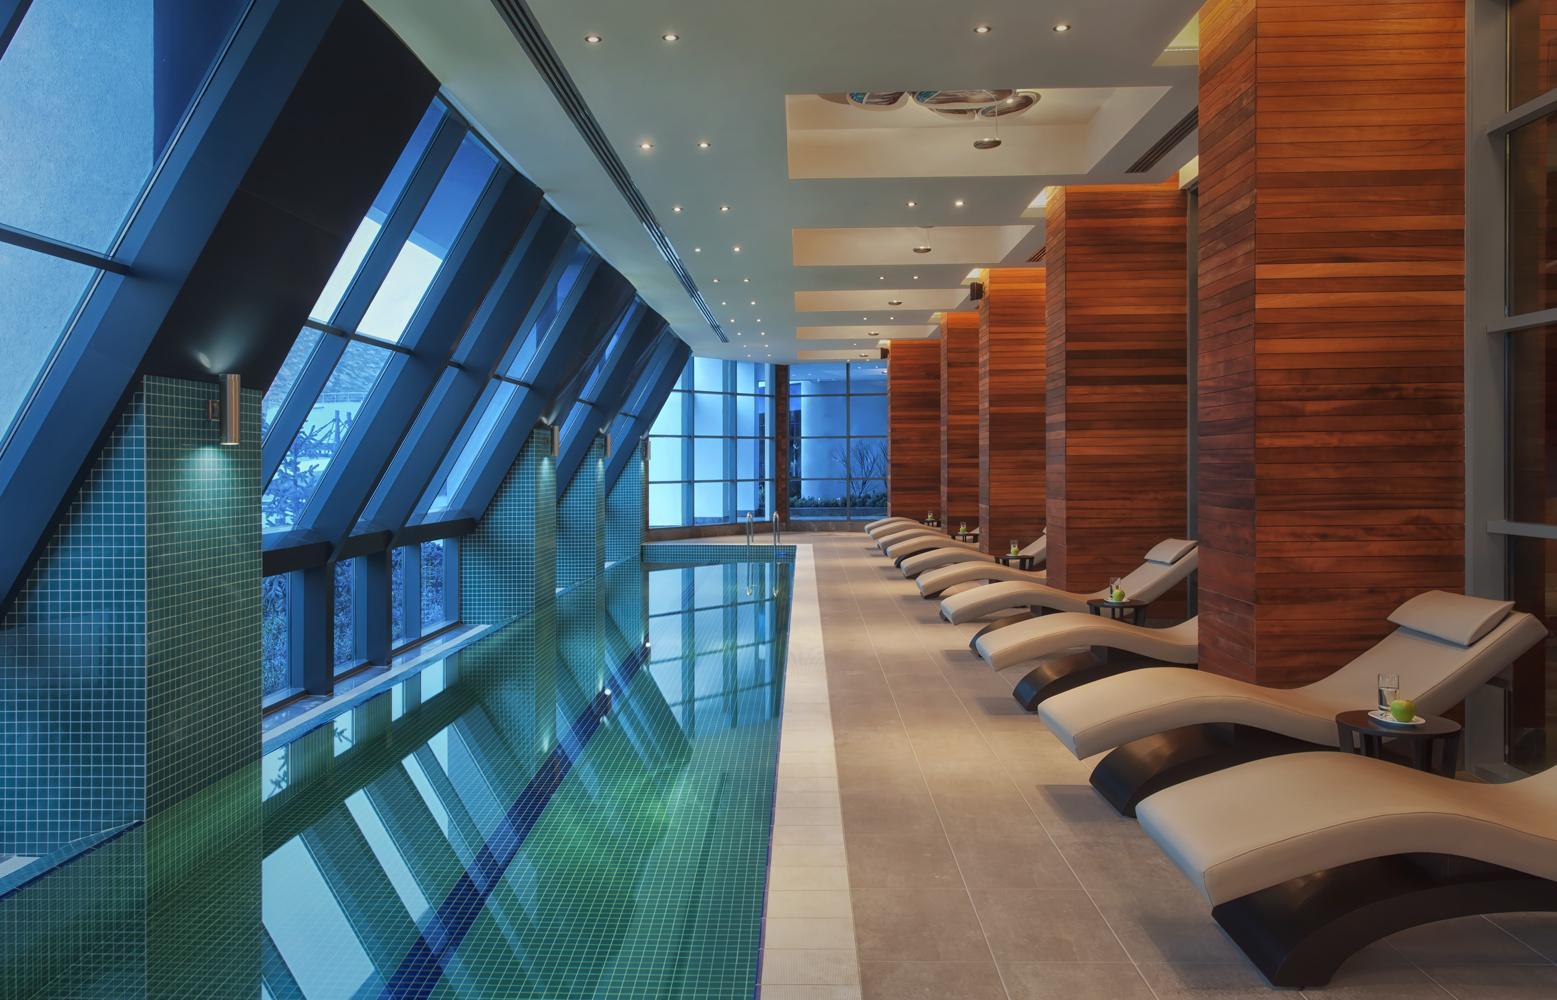 Radisson Blu Hotel and Spa Istanbul Tuzla